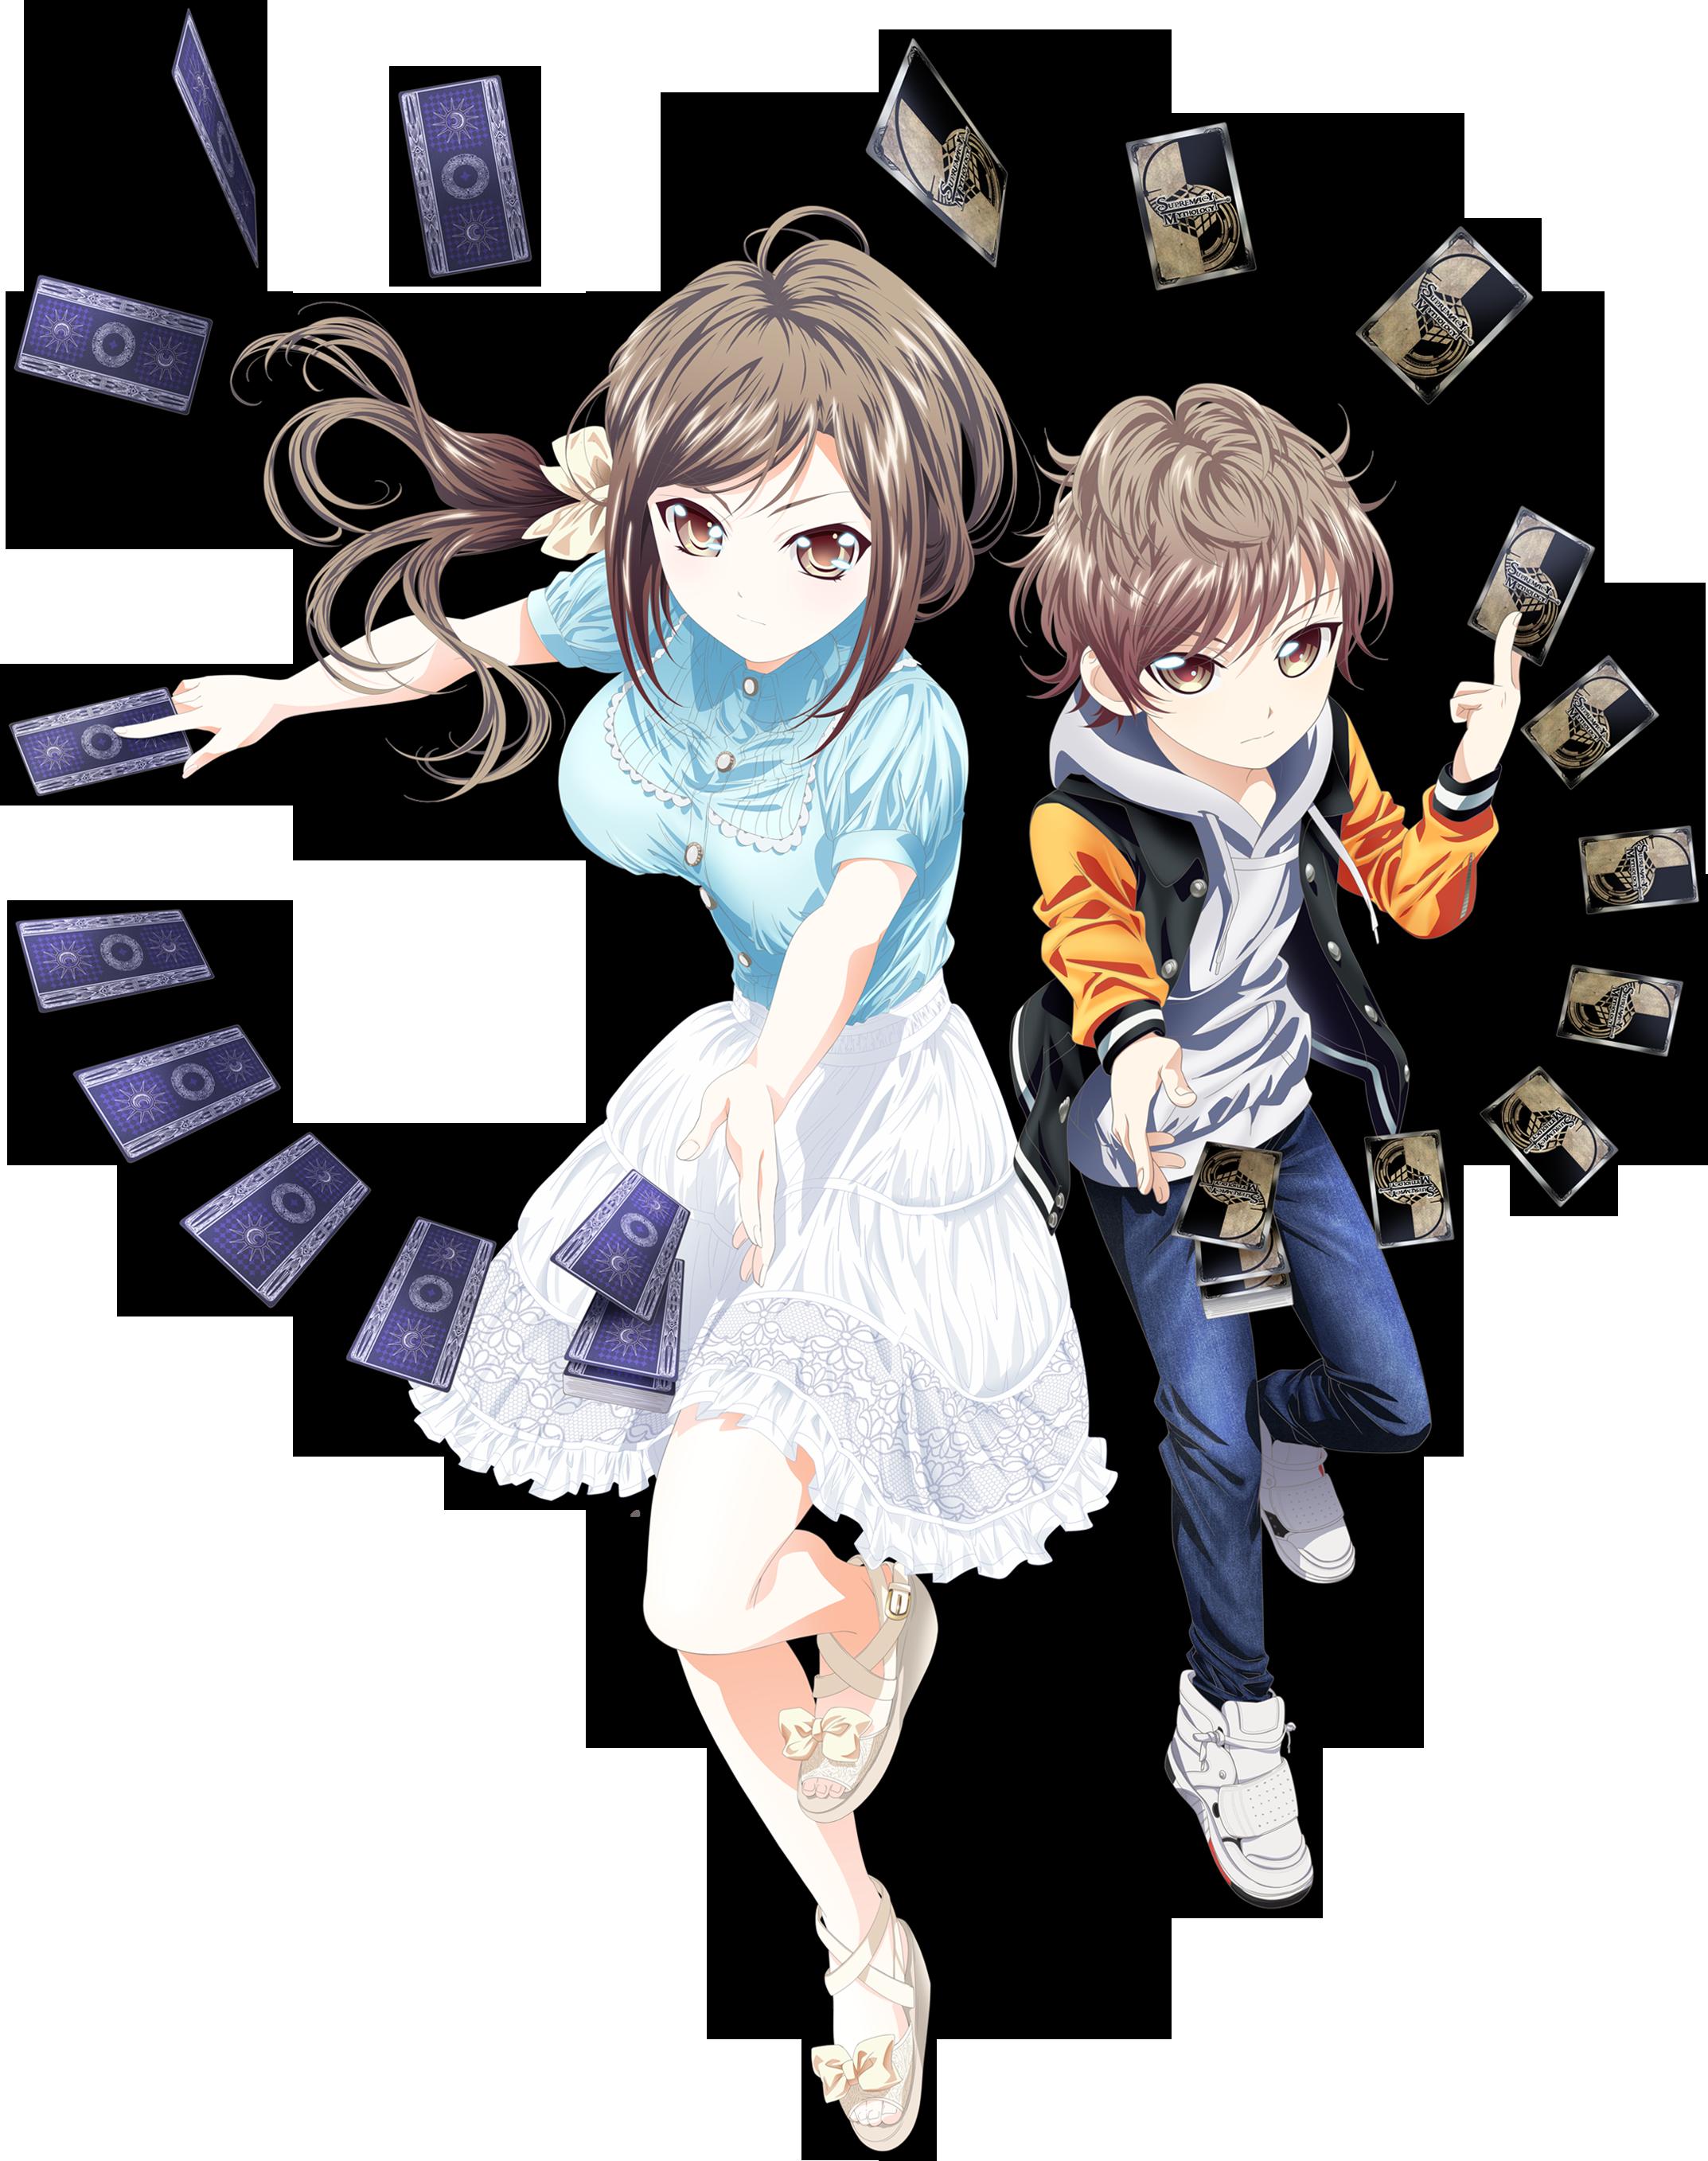 20161215877926.png (2146×2715) キャラクターアート, アニメカップルの漫画, アニメ